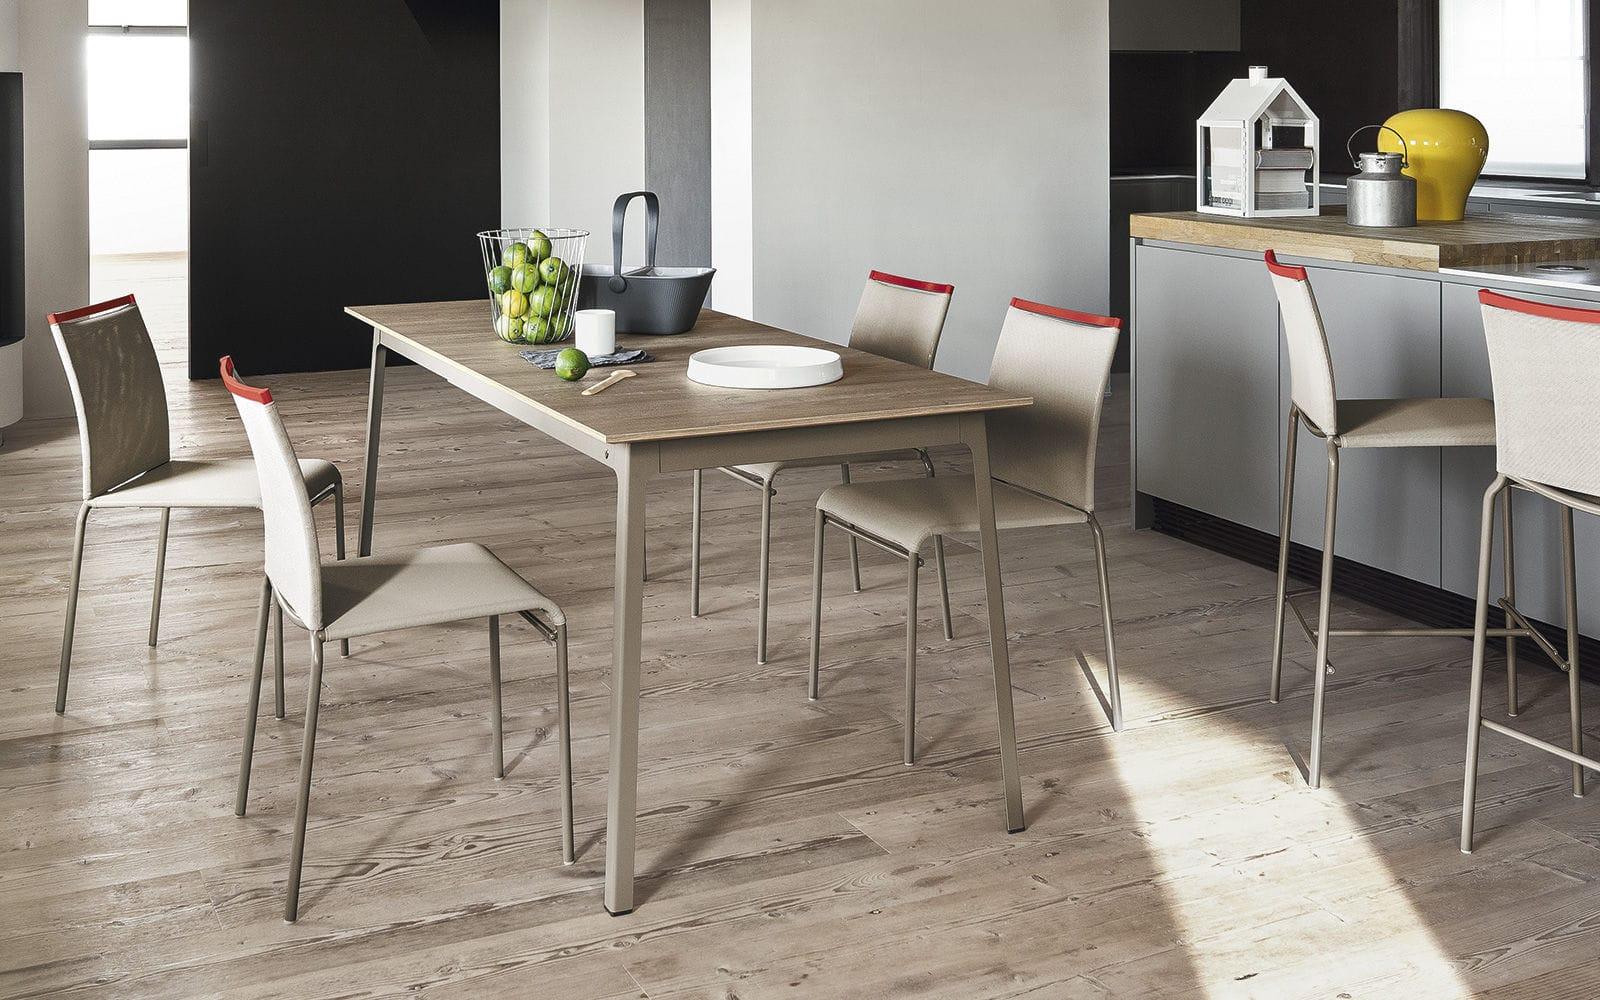 metal kitchen tables gas stoves 现代风格餐桌 木质 金属 三聚氰胺 dot by gino carollo calligaris